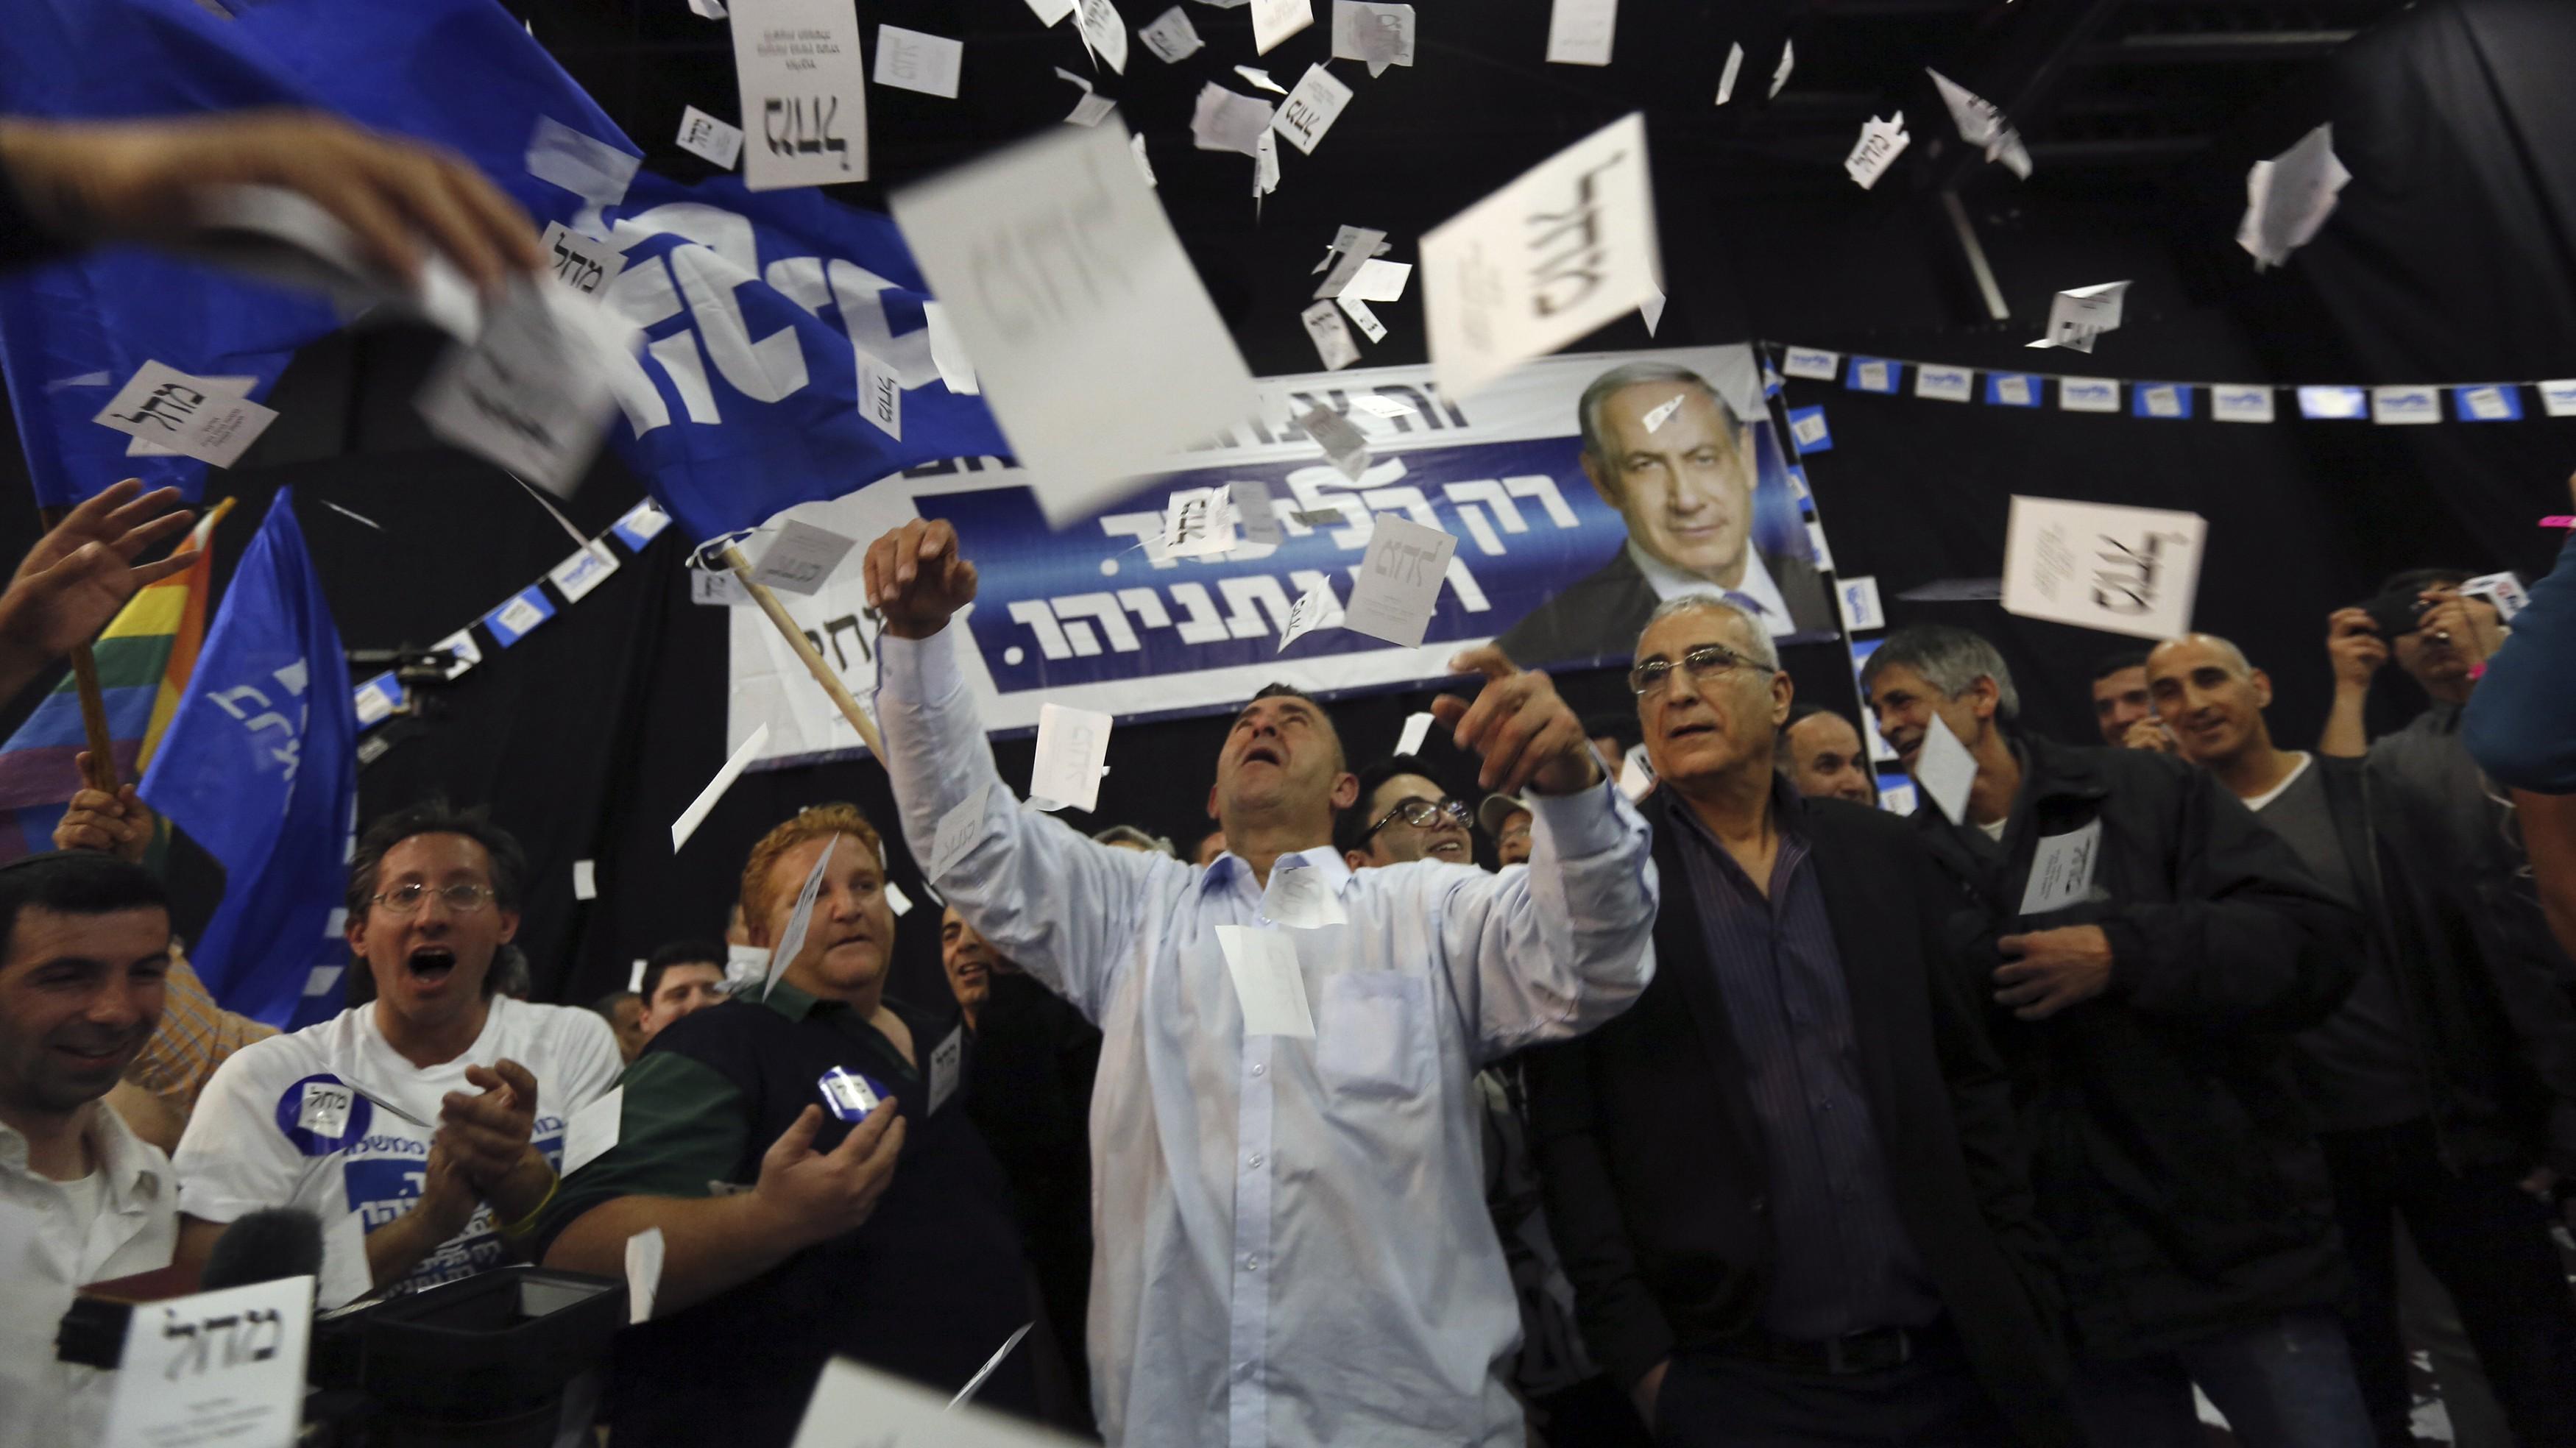 israel election - HD3500×1968